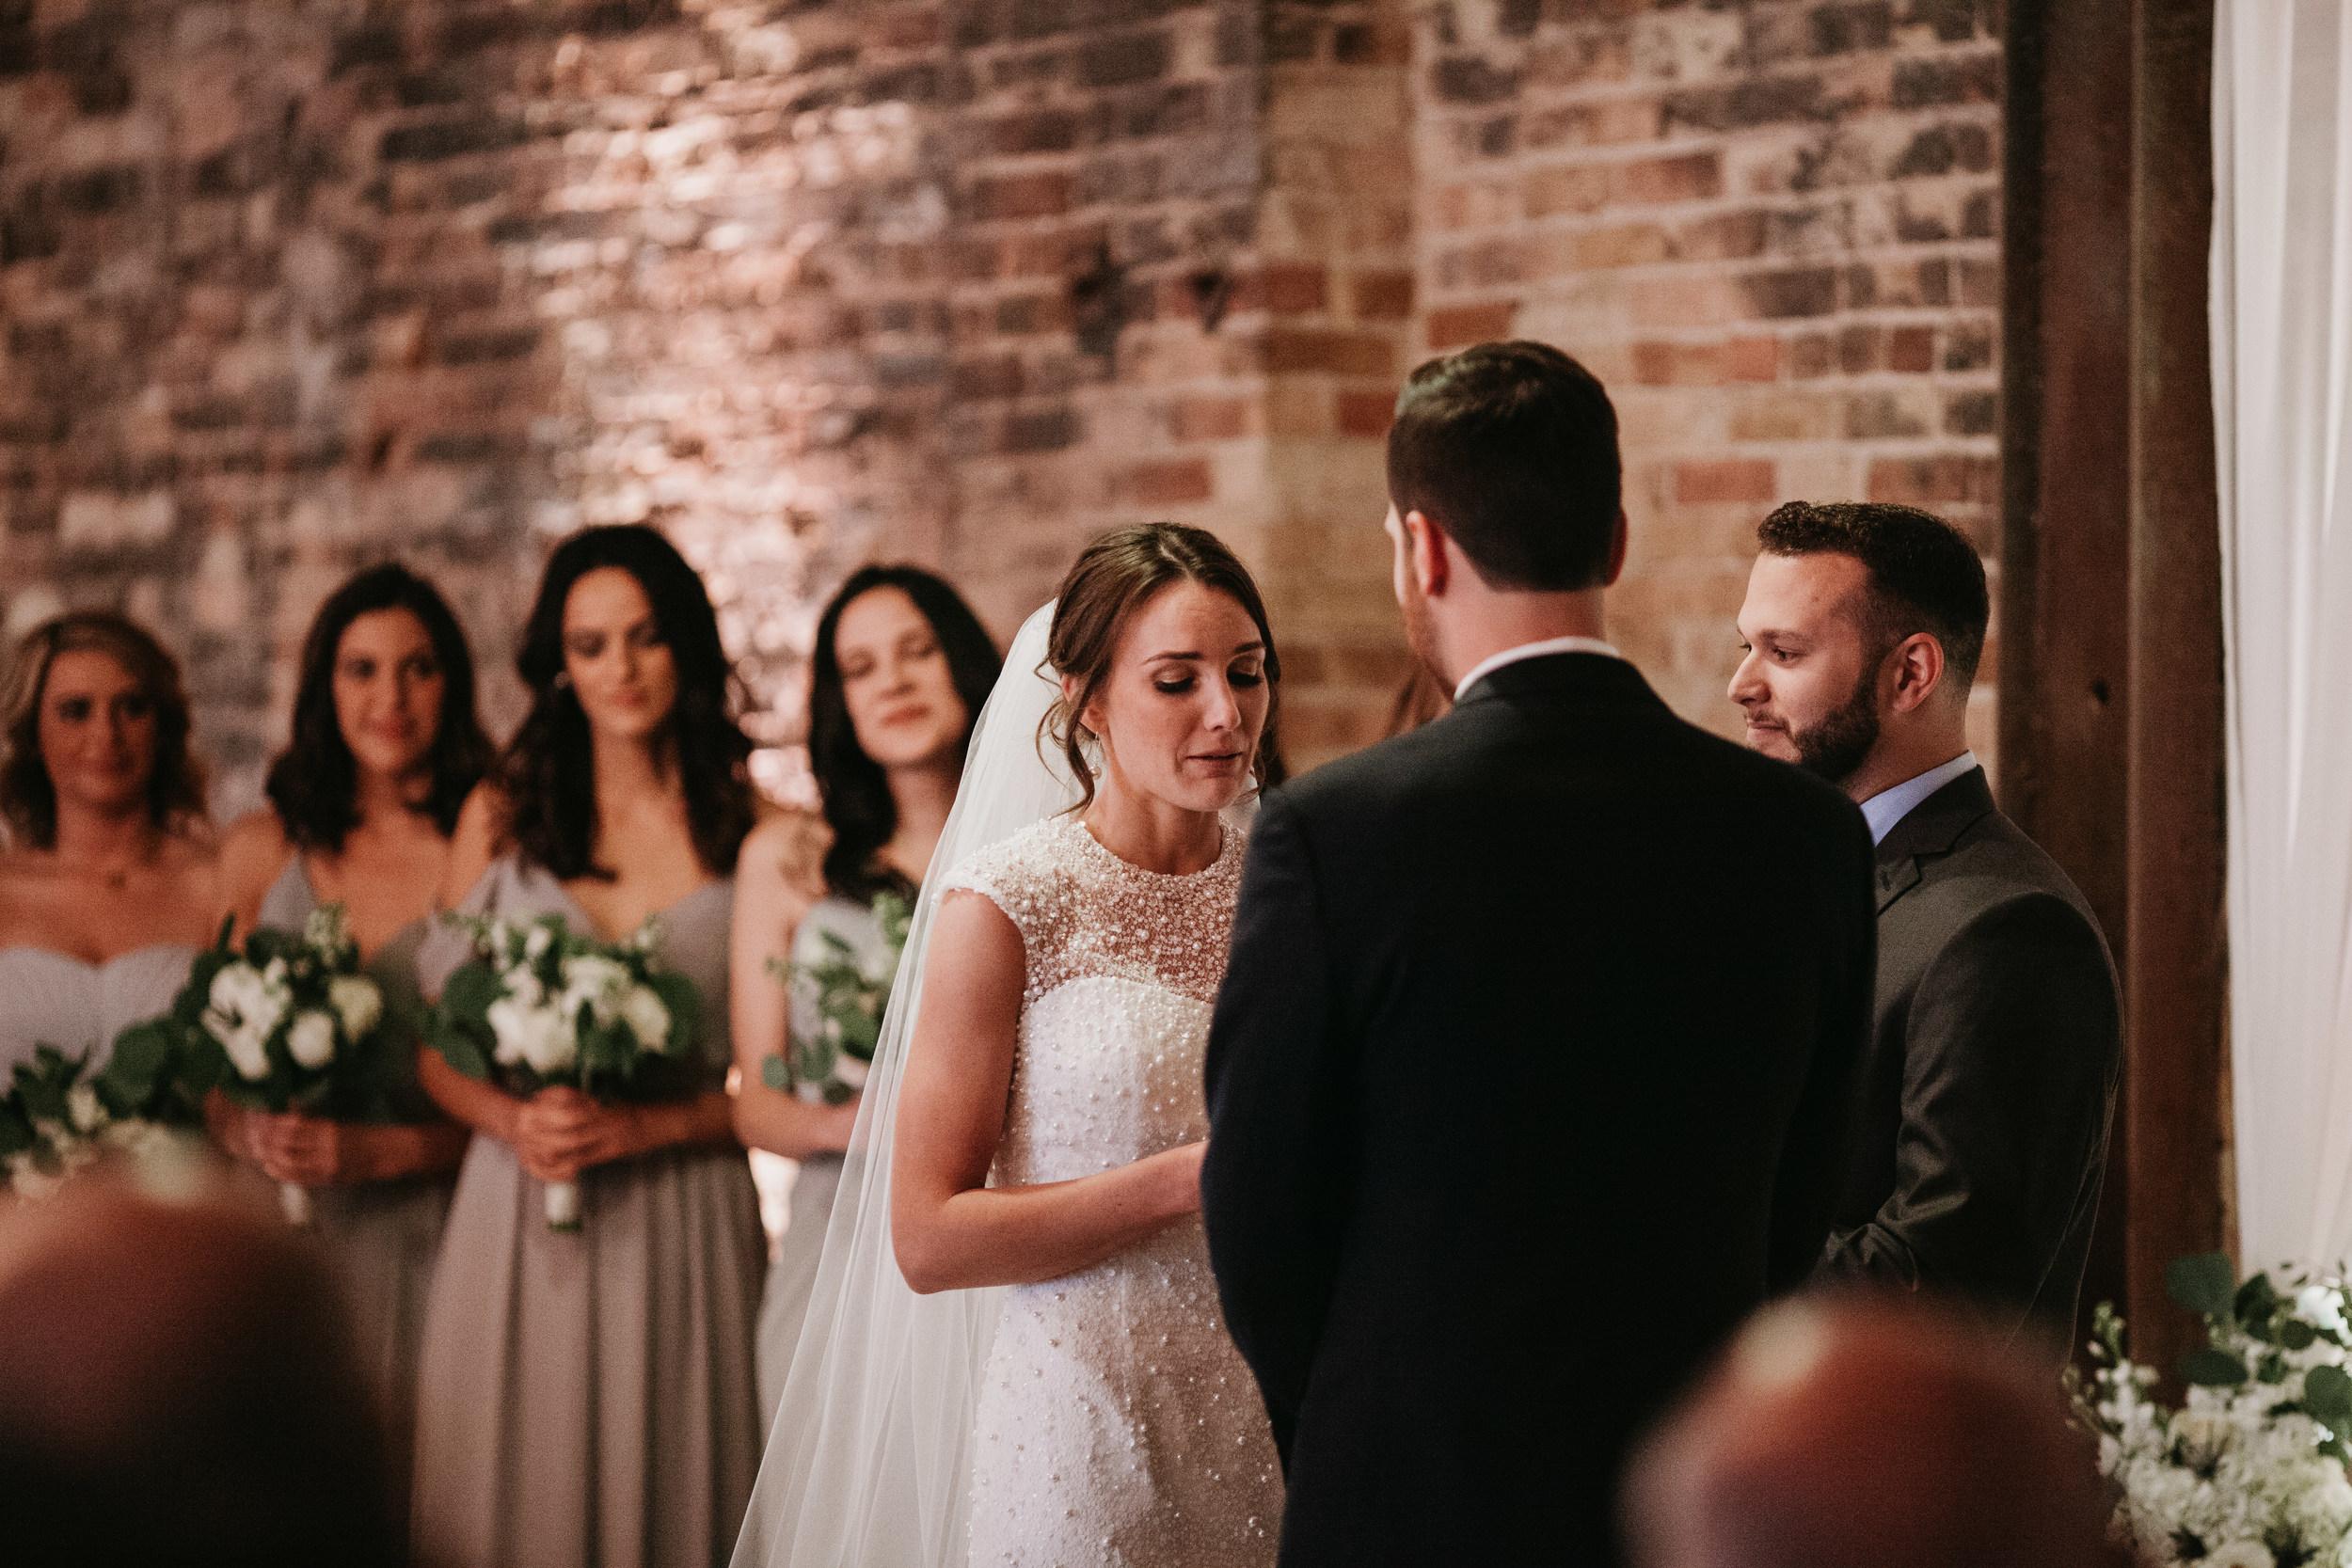 kenmare loft wedding vows